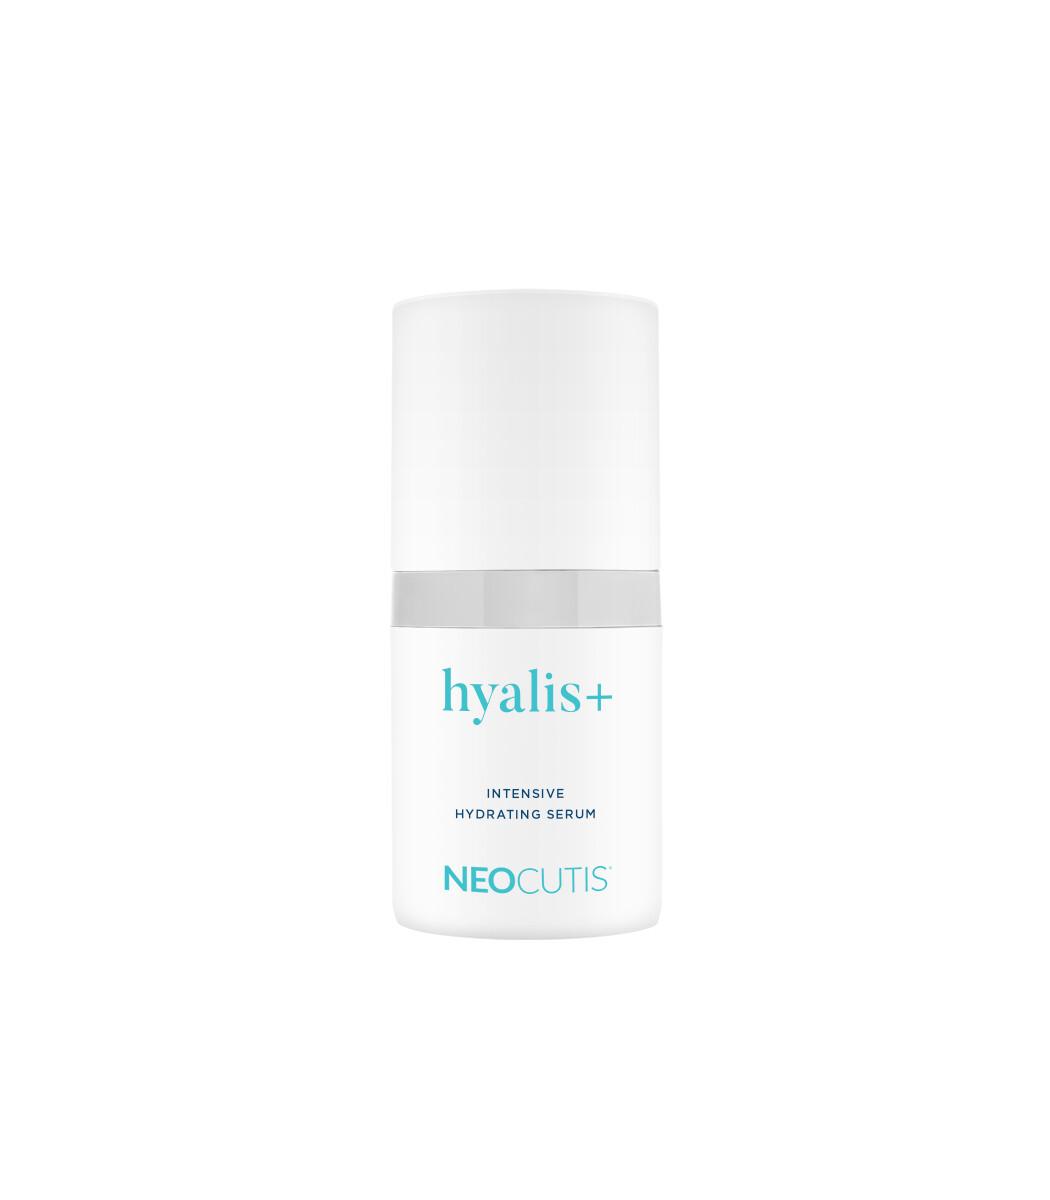 HYALIS+ 15 ml (0.5 fl oz)